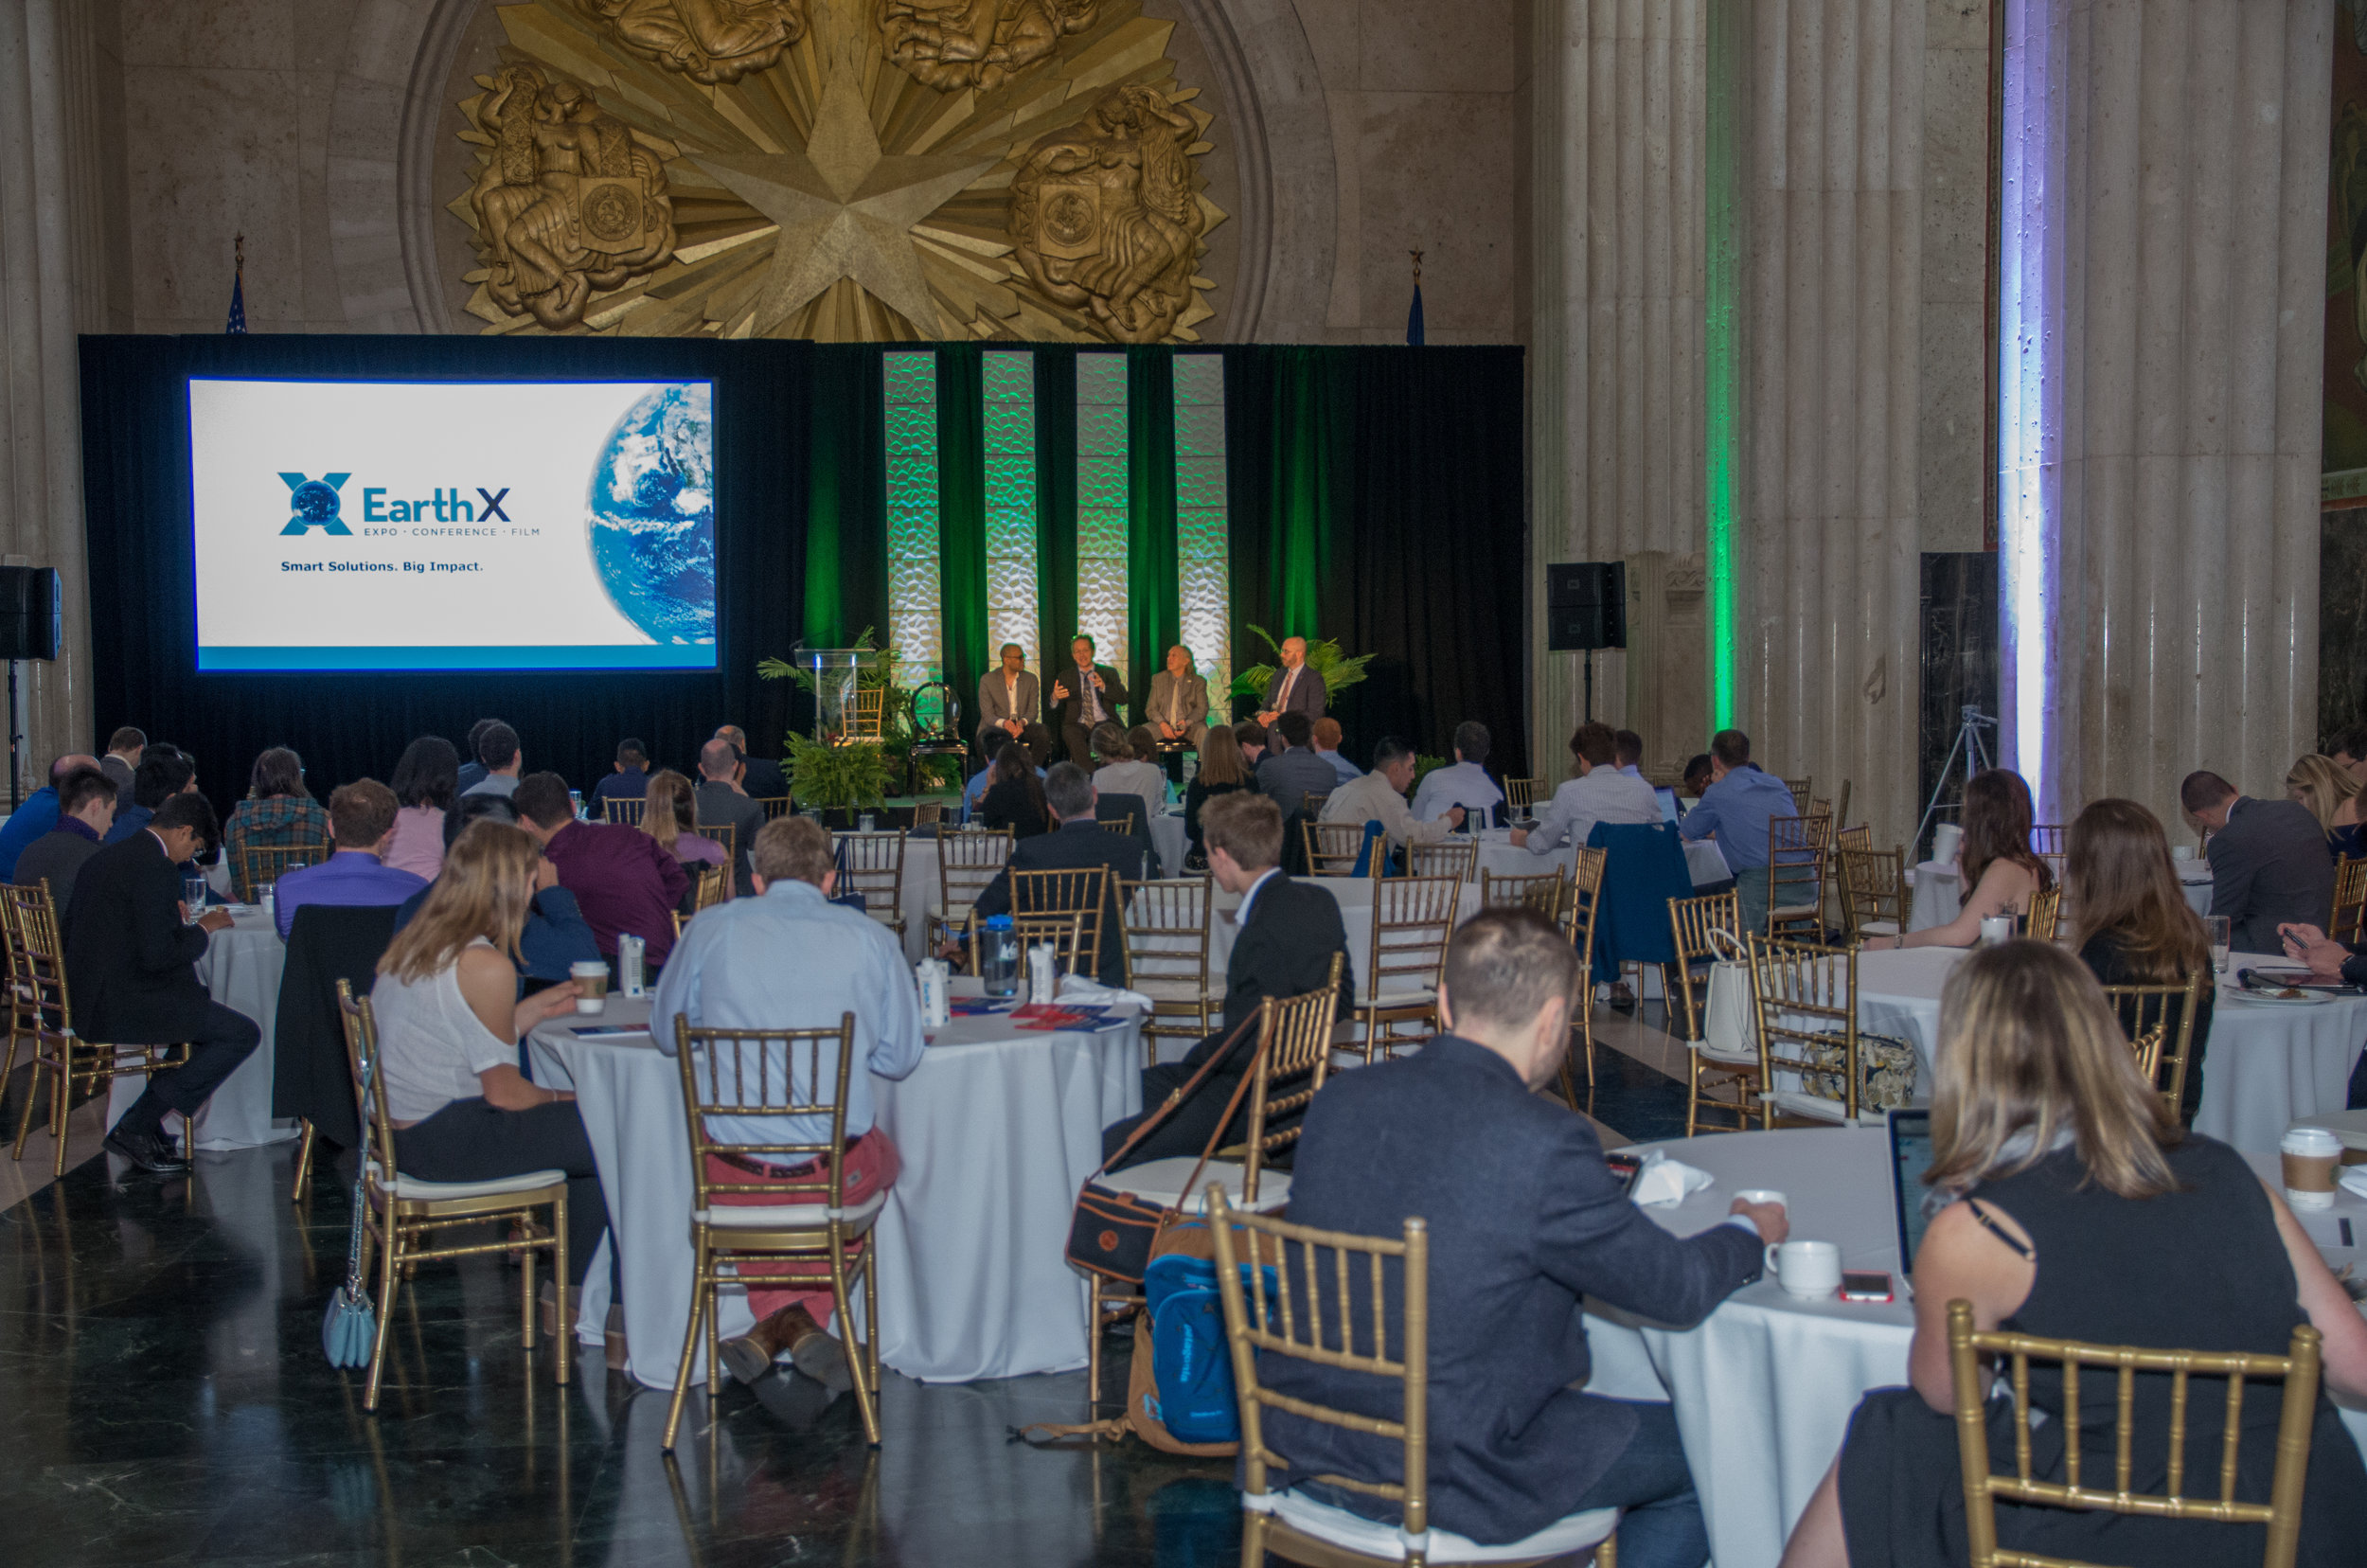 2018-04-21 - EarthX Bridge Summit Conference (SD) 029.jpg